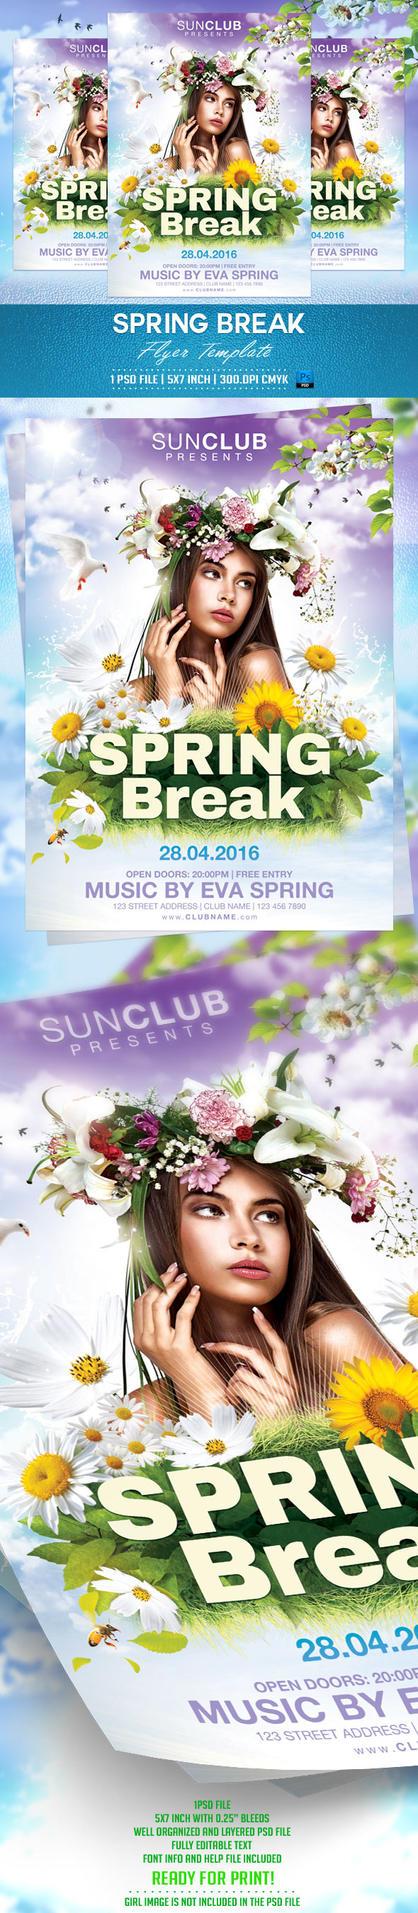 Spring Break Flyer Template by BriellDesign